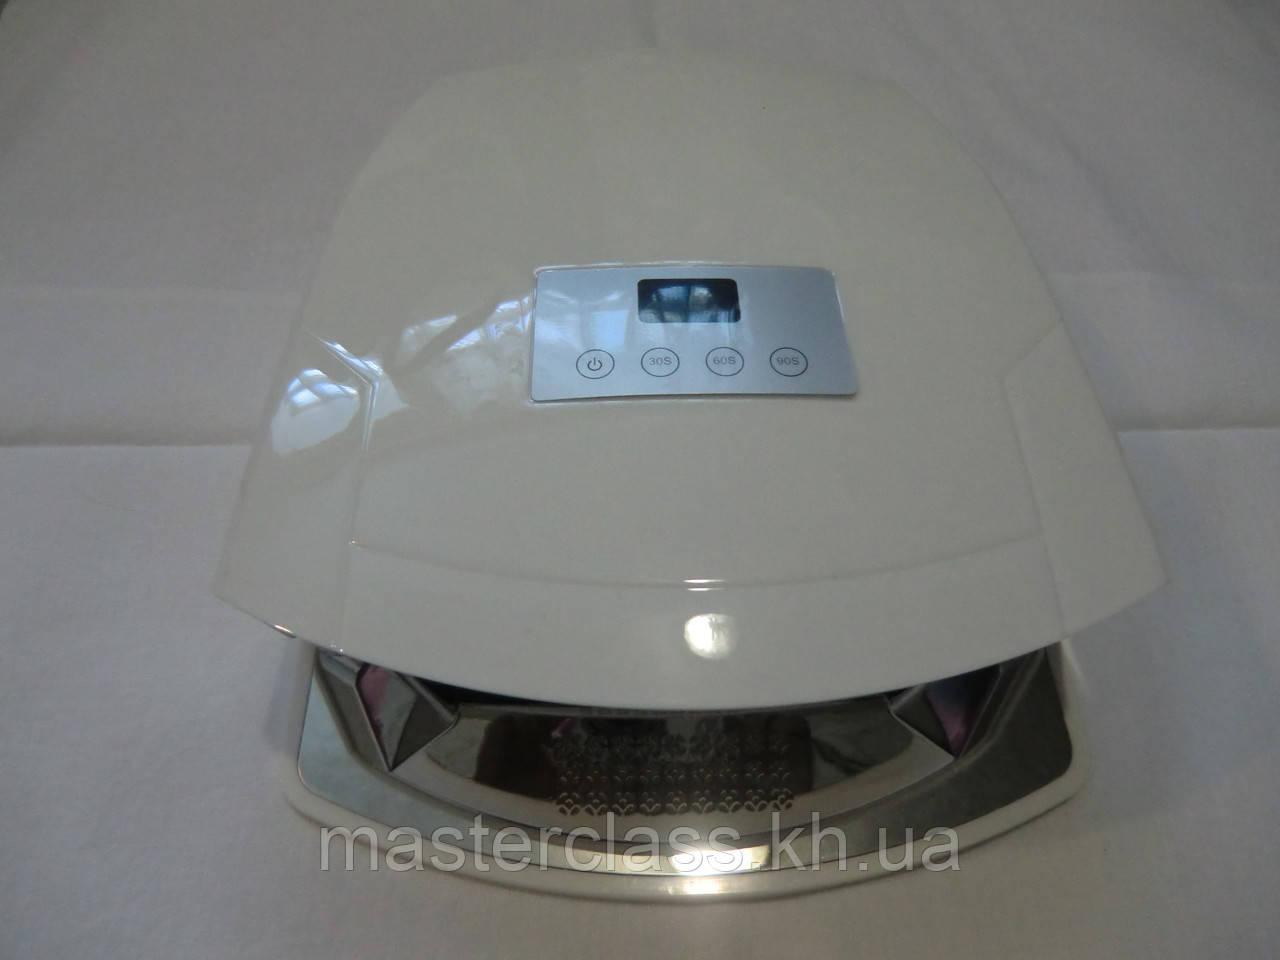 LED UV Лампа для маникюра и педикюра JSDA 48 W